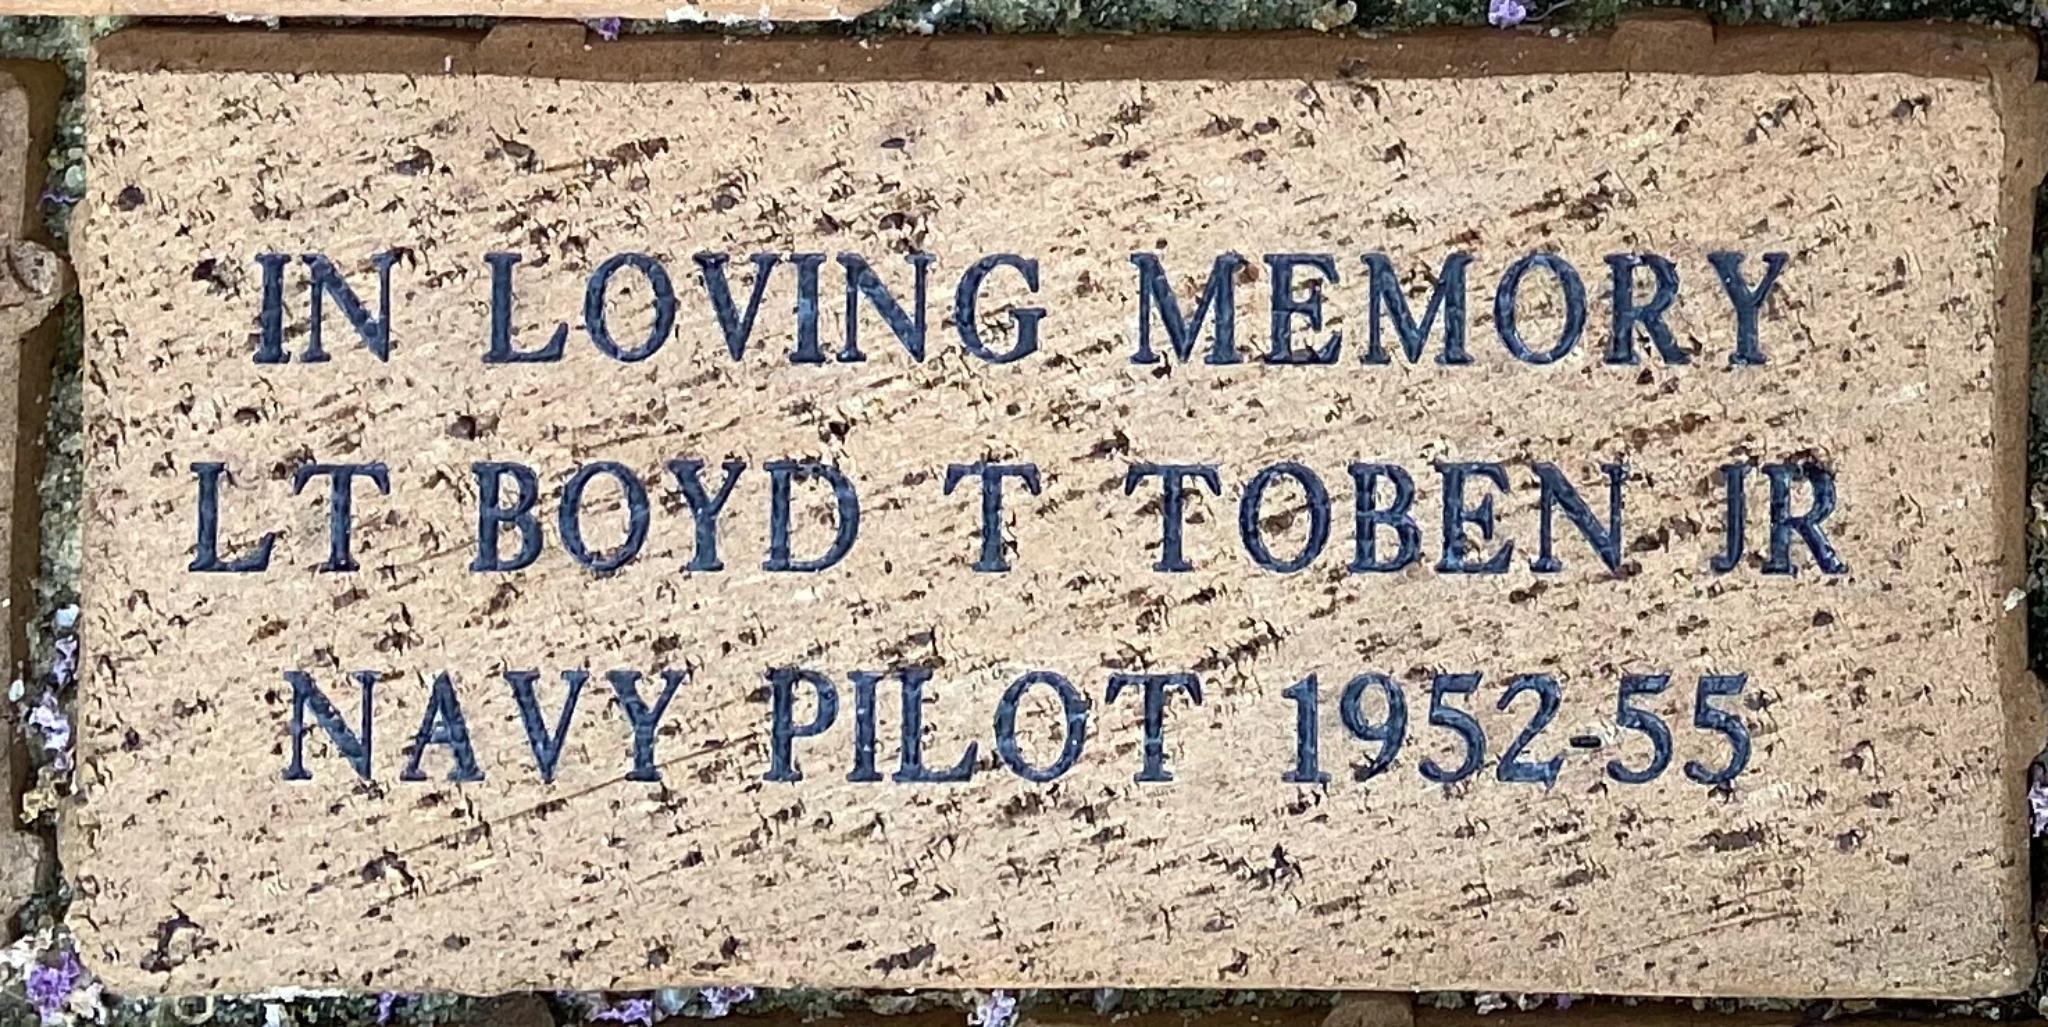 IN LOVING MEMORY  LT BOYD T TOBEN JR. NAVY PILOT 1952-55